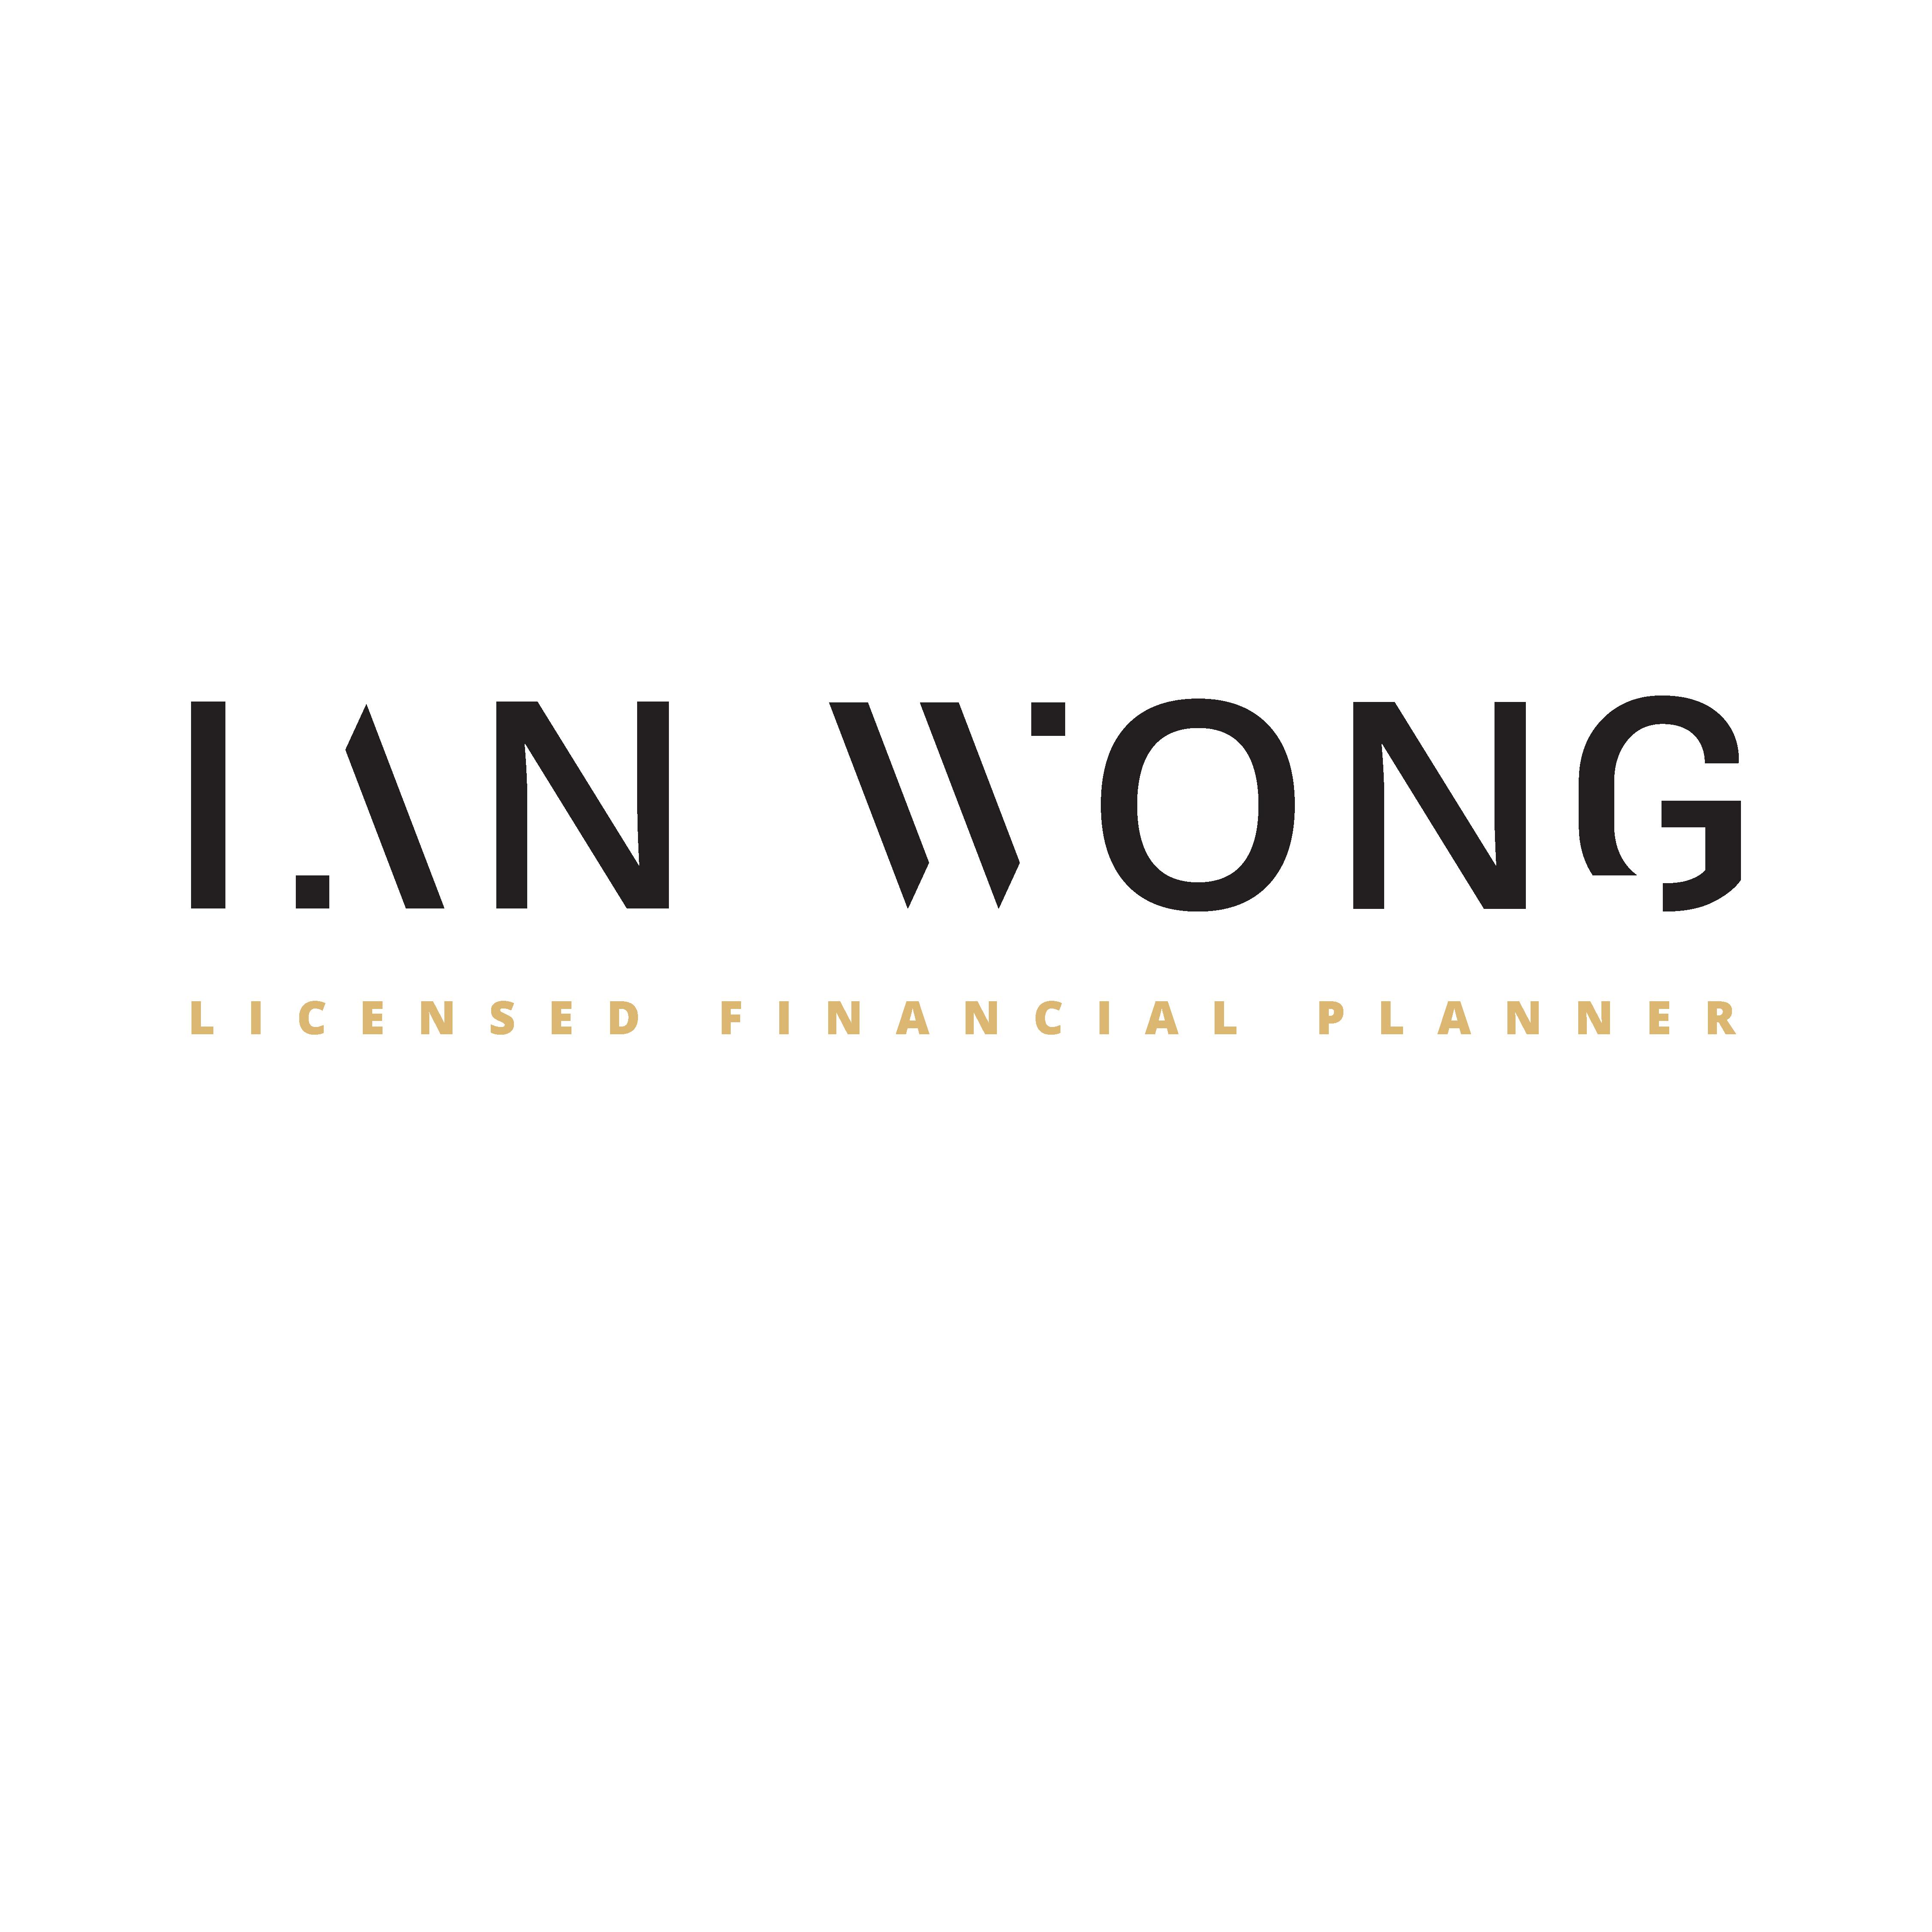 IanWong-logo